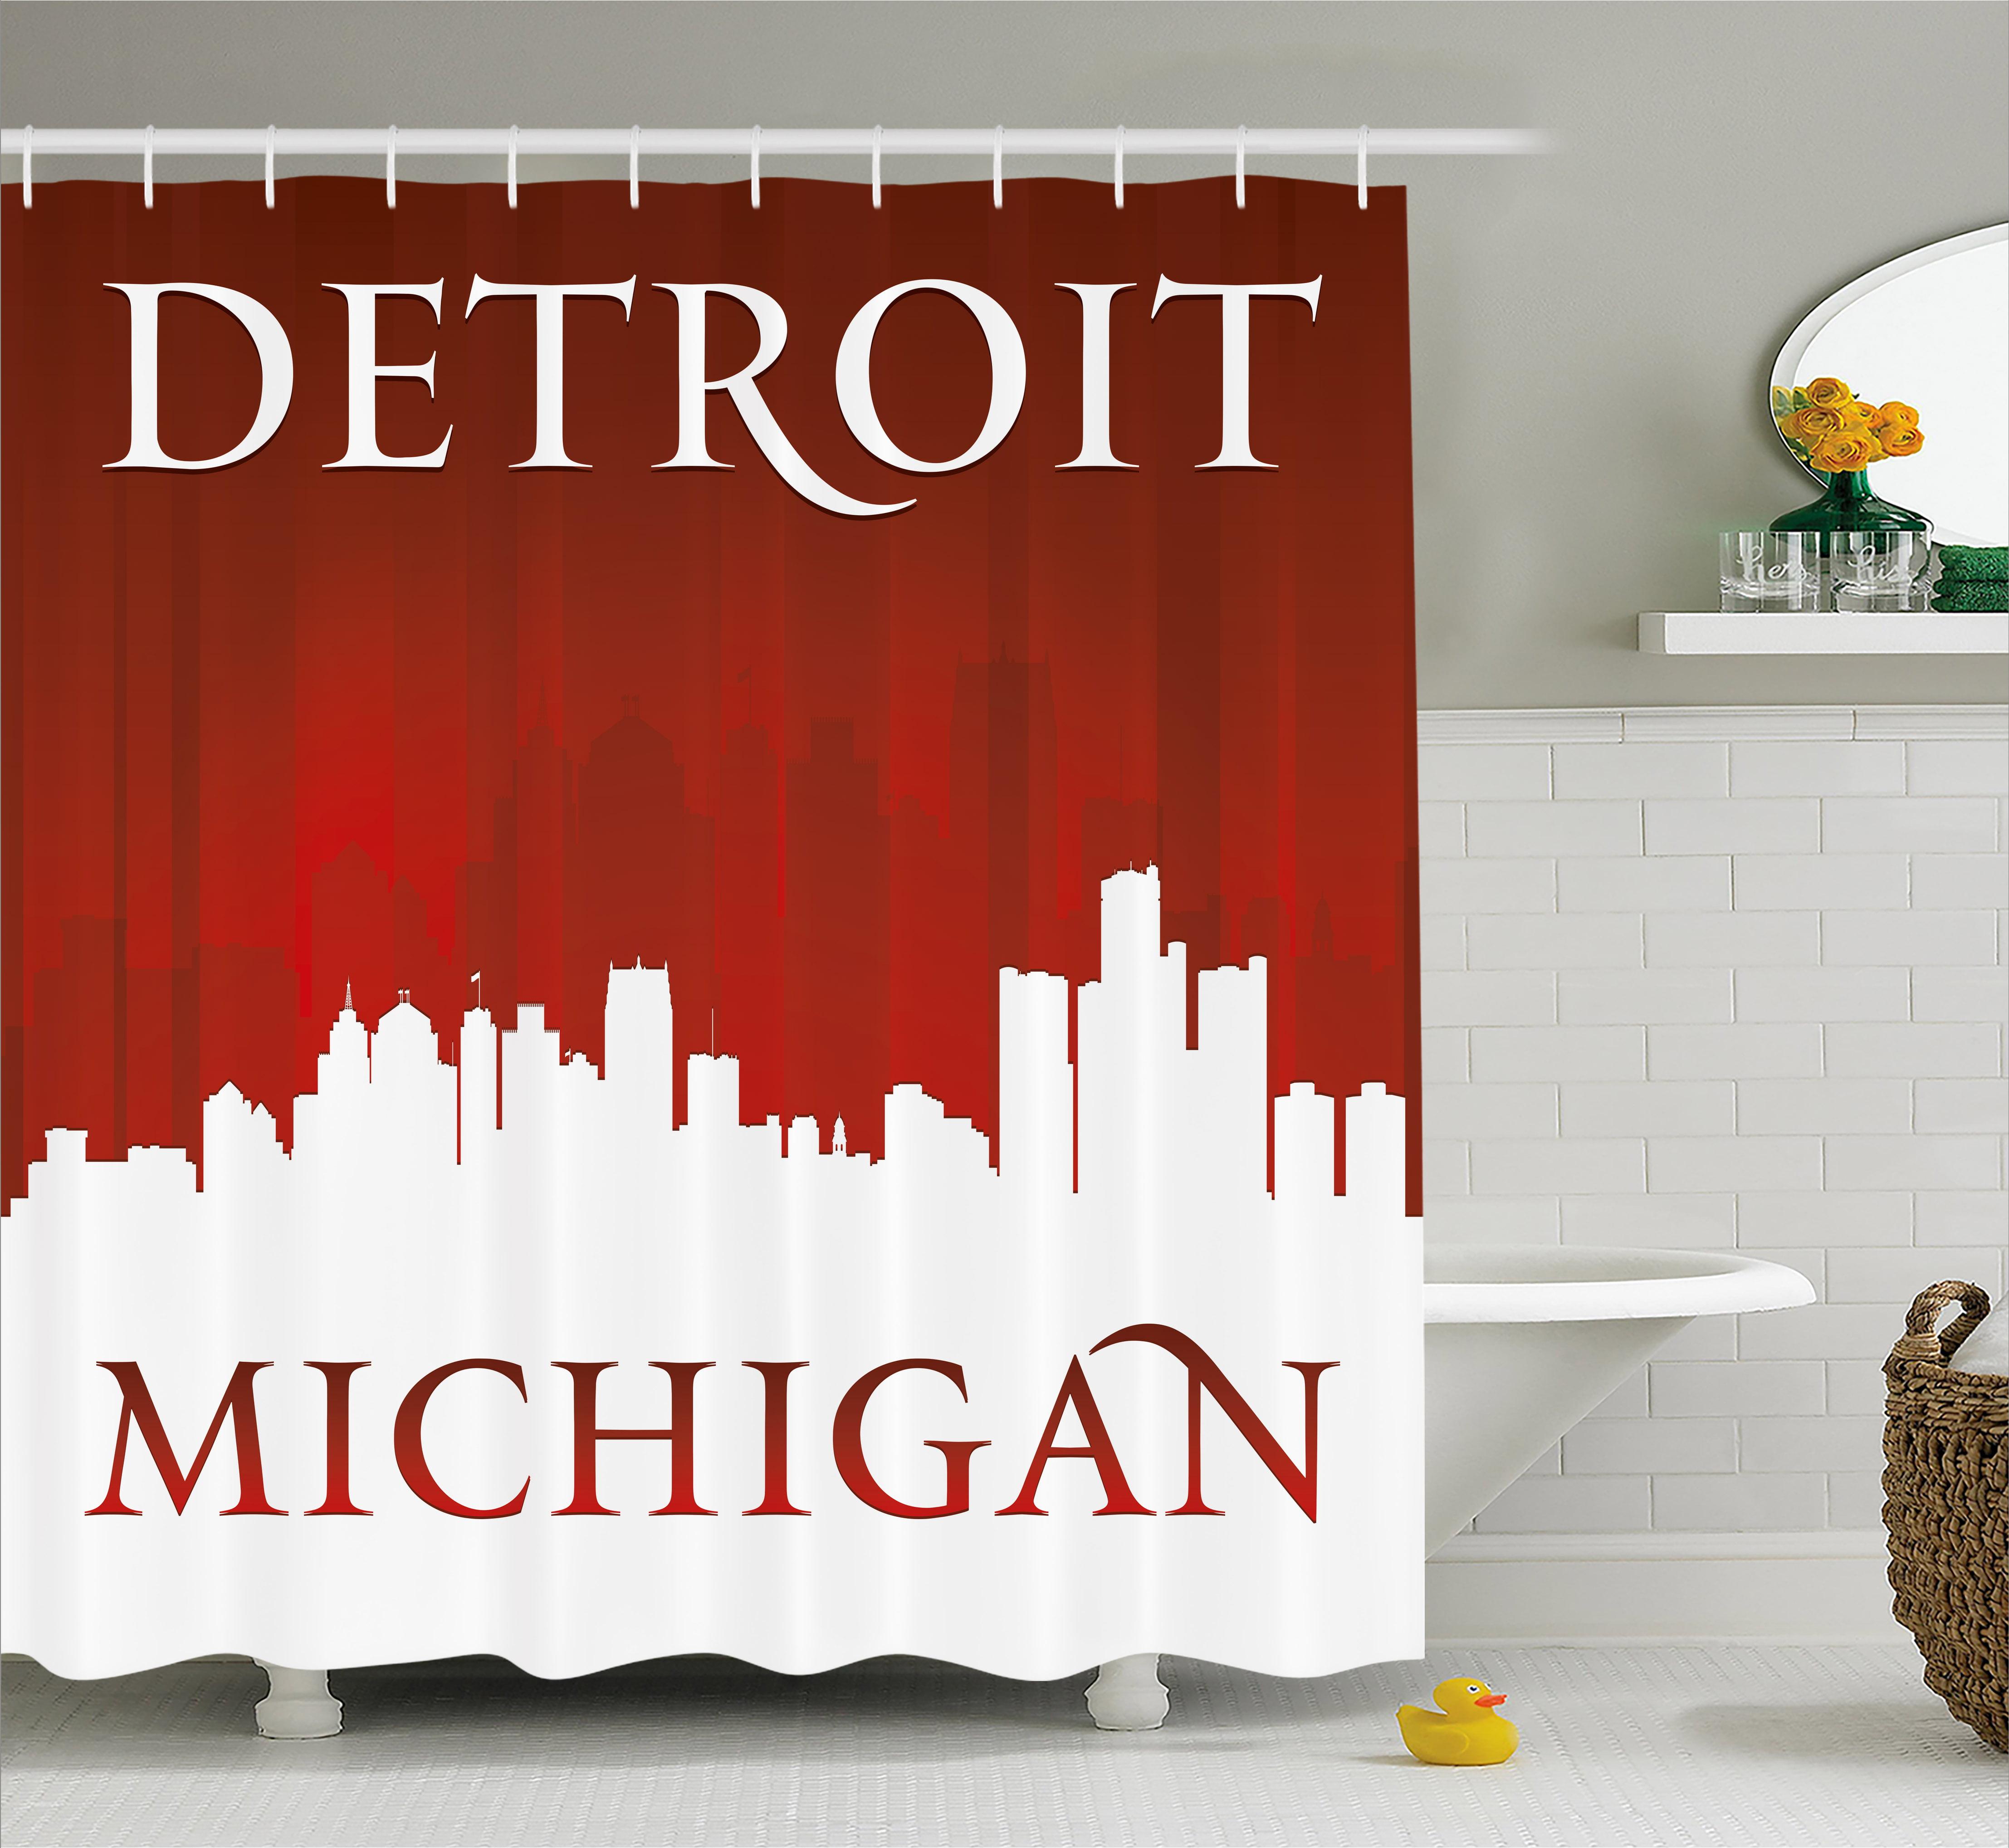 Detroit Decor Shower Curtain, Michigan City Silhouette Re...